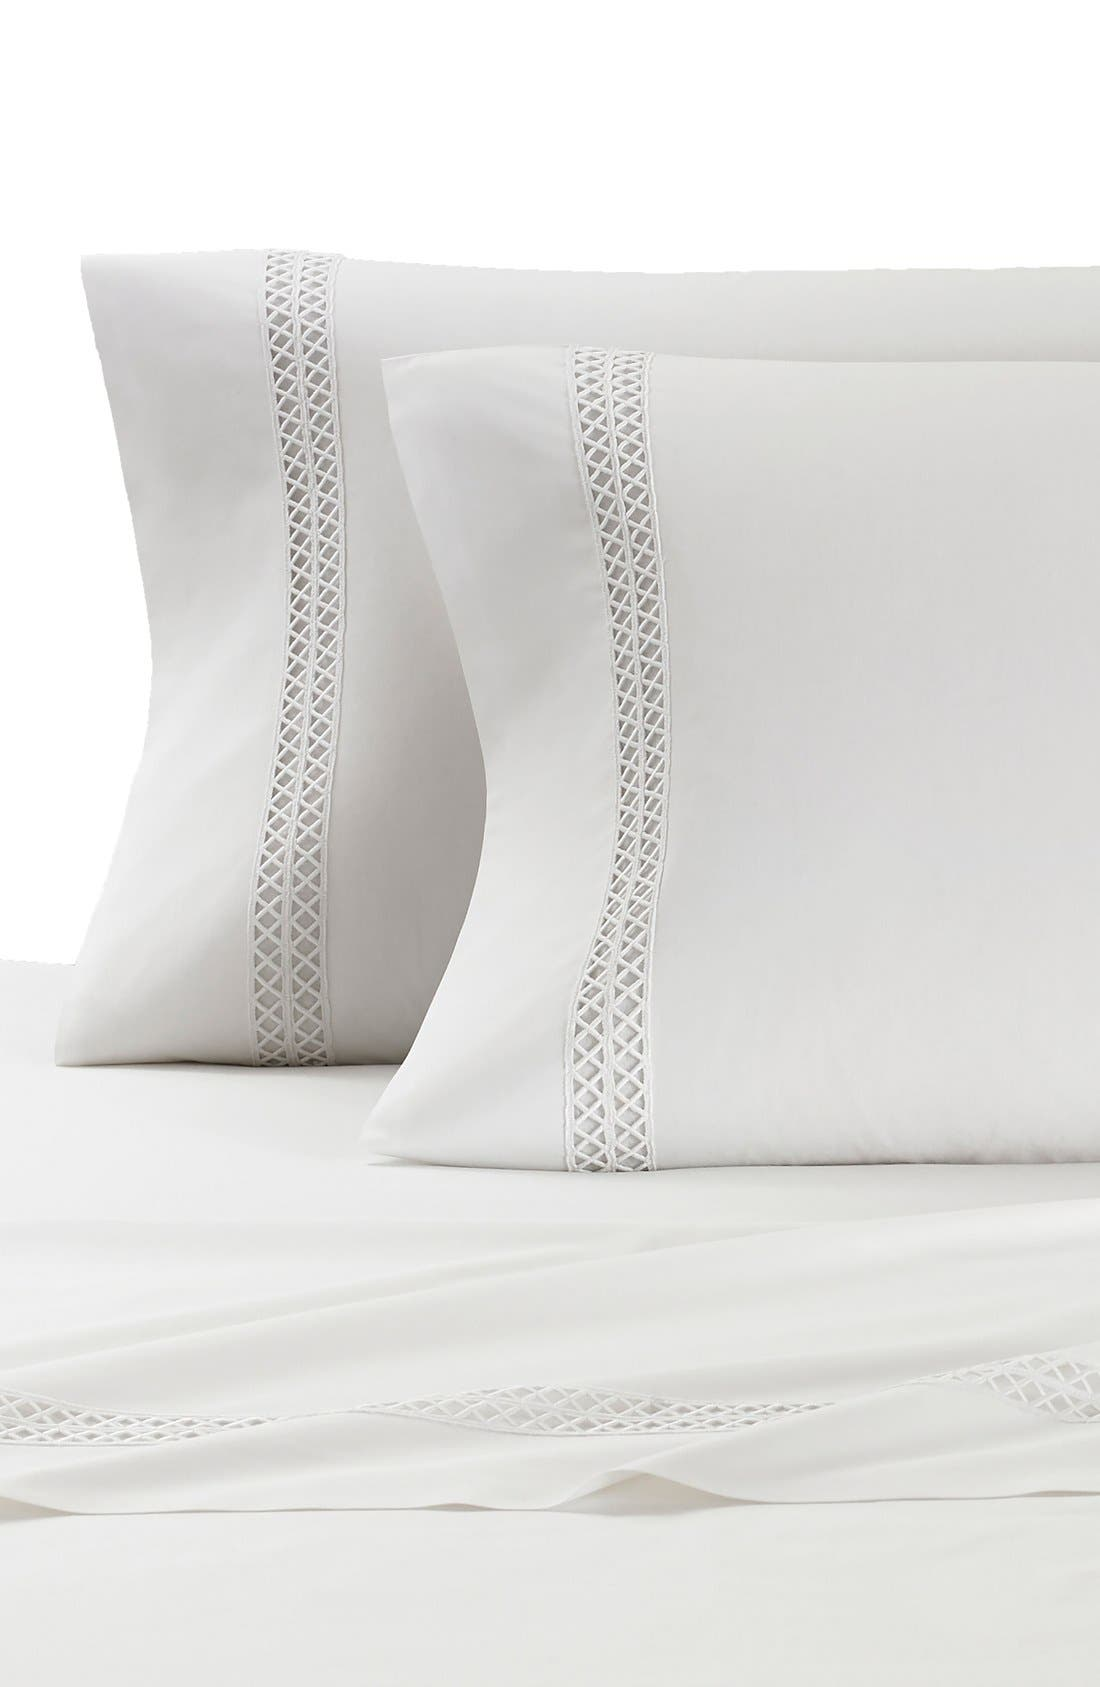 KASSATEX Emilia Pillowcases